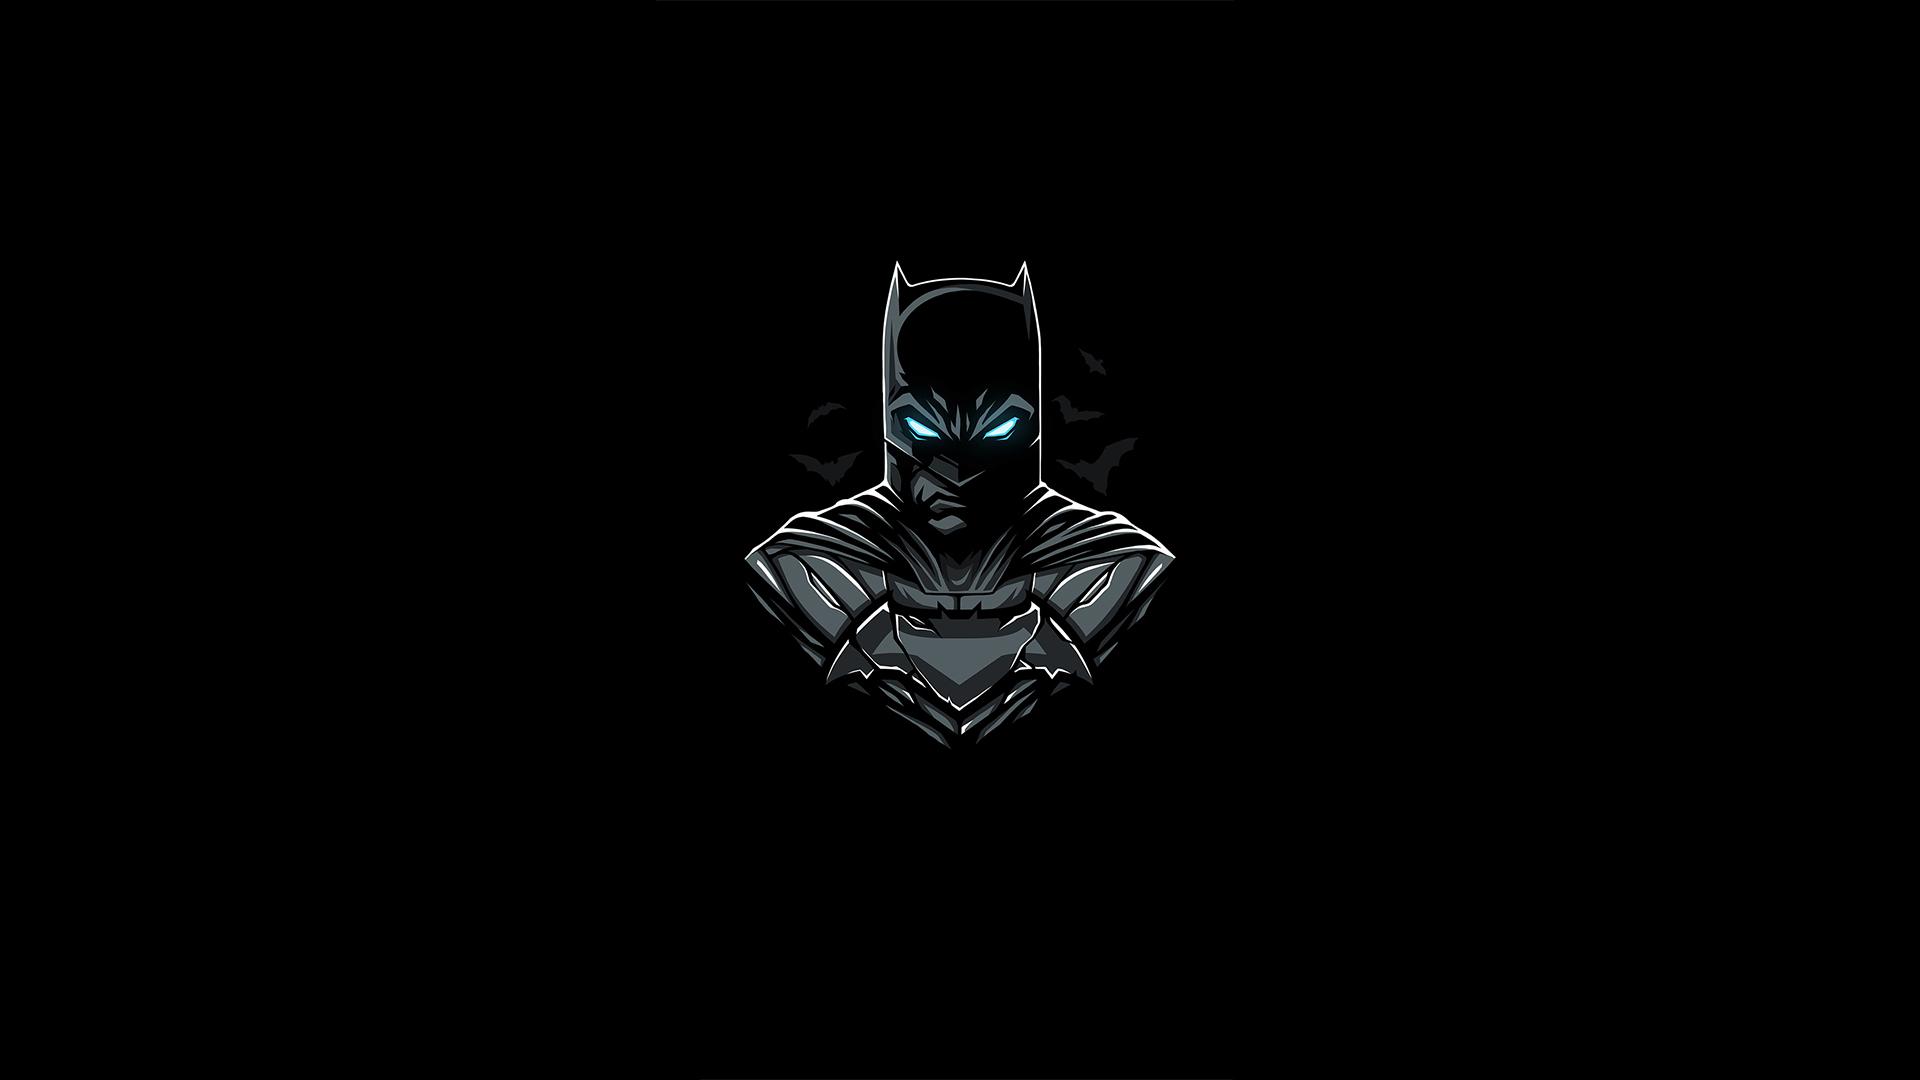 1920x1080 Batman Amoled Laptop Full HD 1080P HD 4k ...